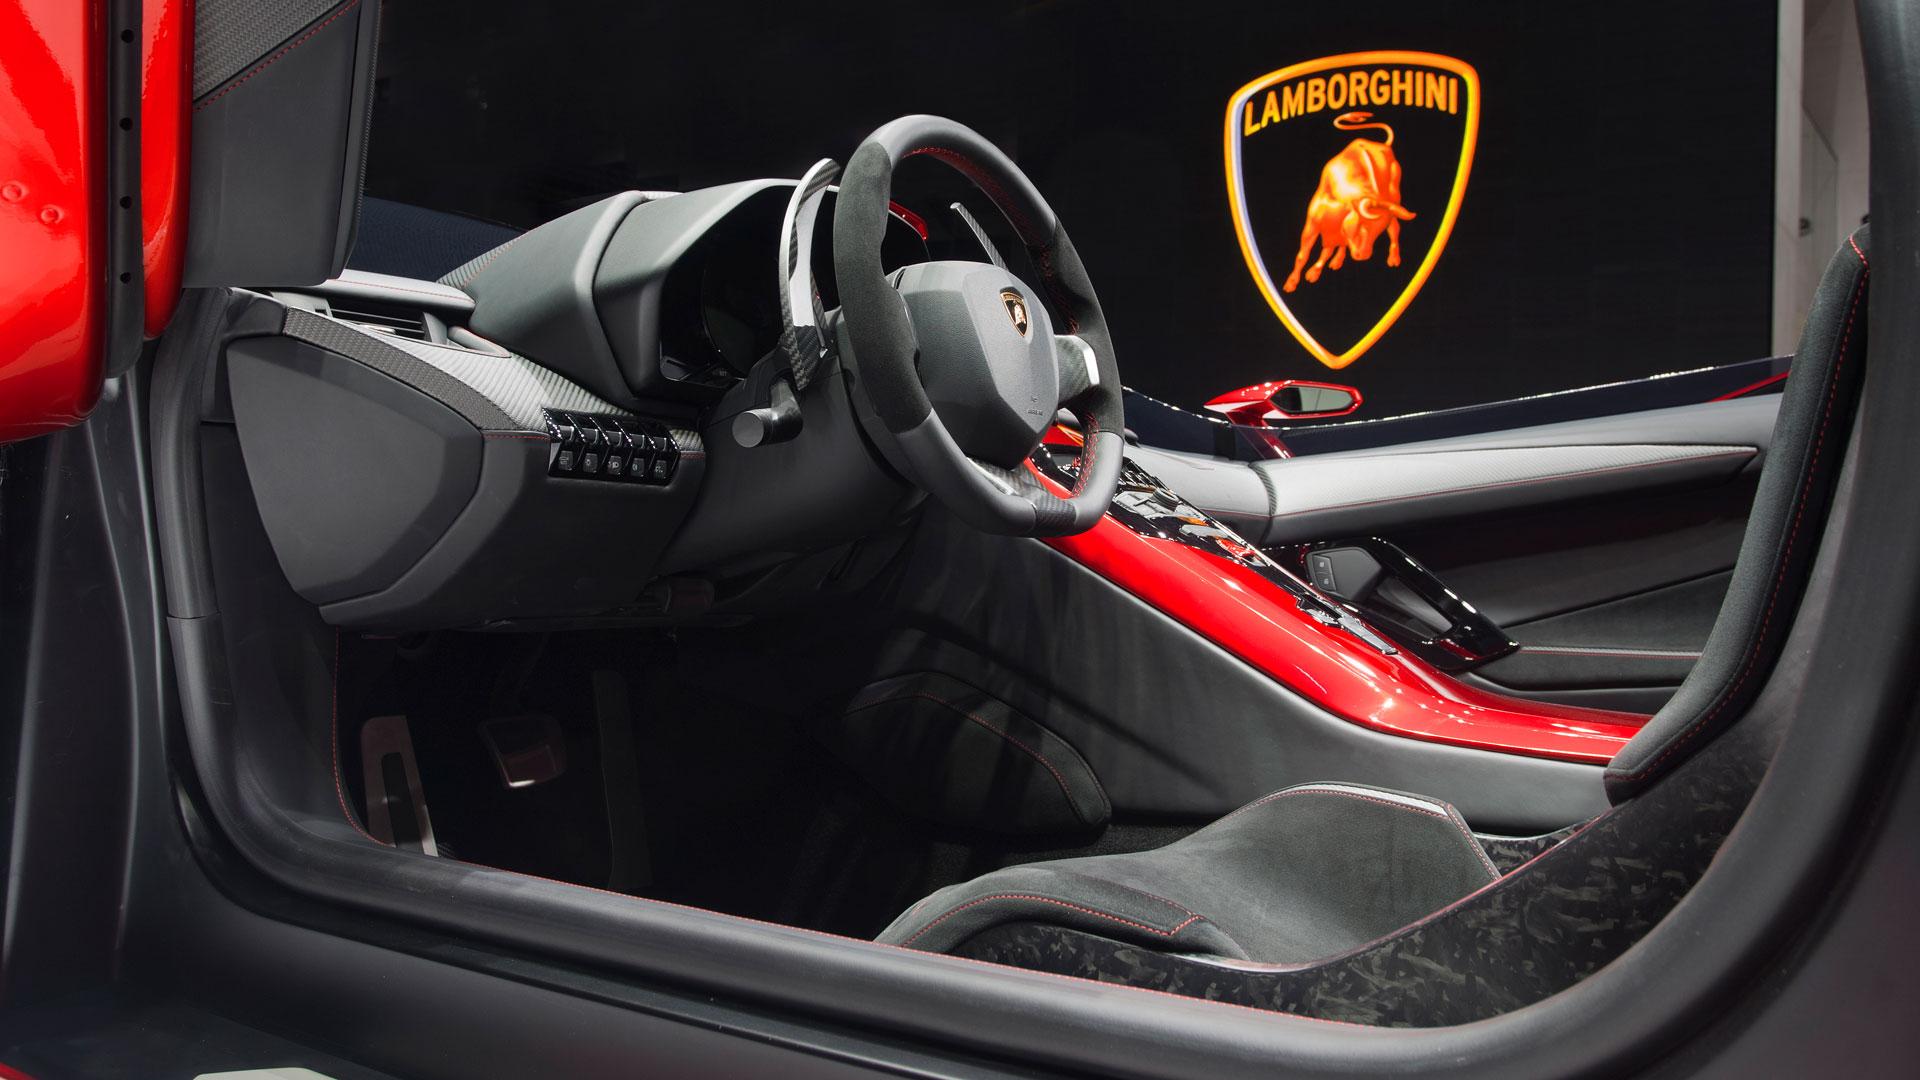 Lamborghini Aventador J-ห้องโดยสาร